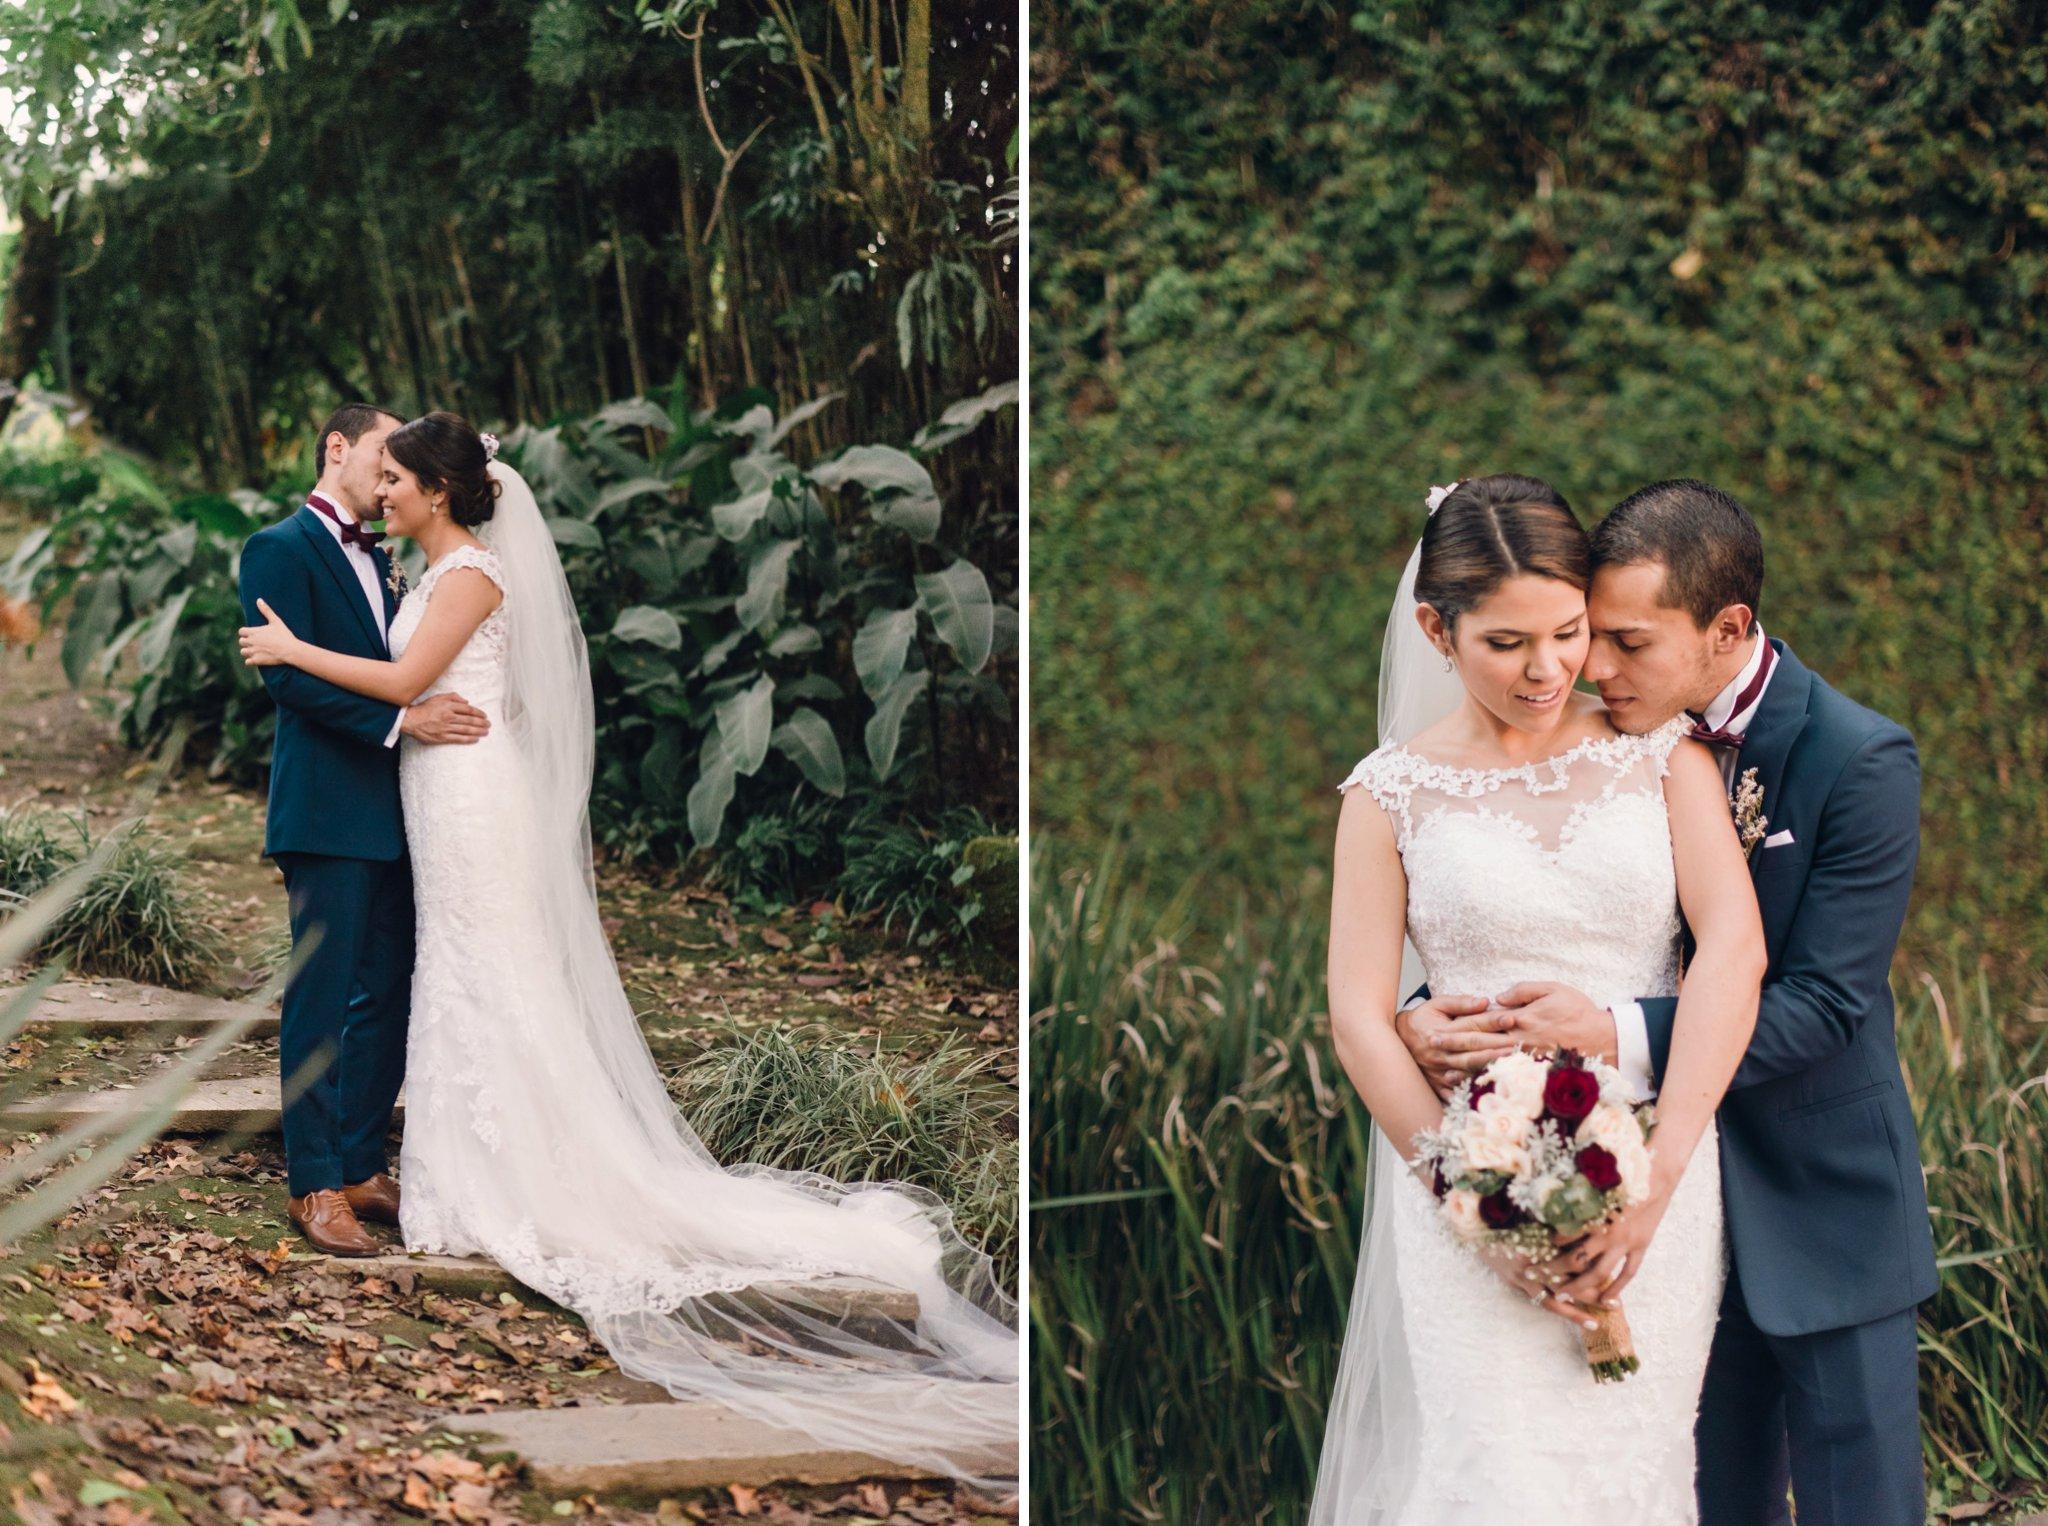 Maria_Mauricio_costa_rica_wedding_photography_0030.jpg